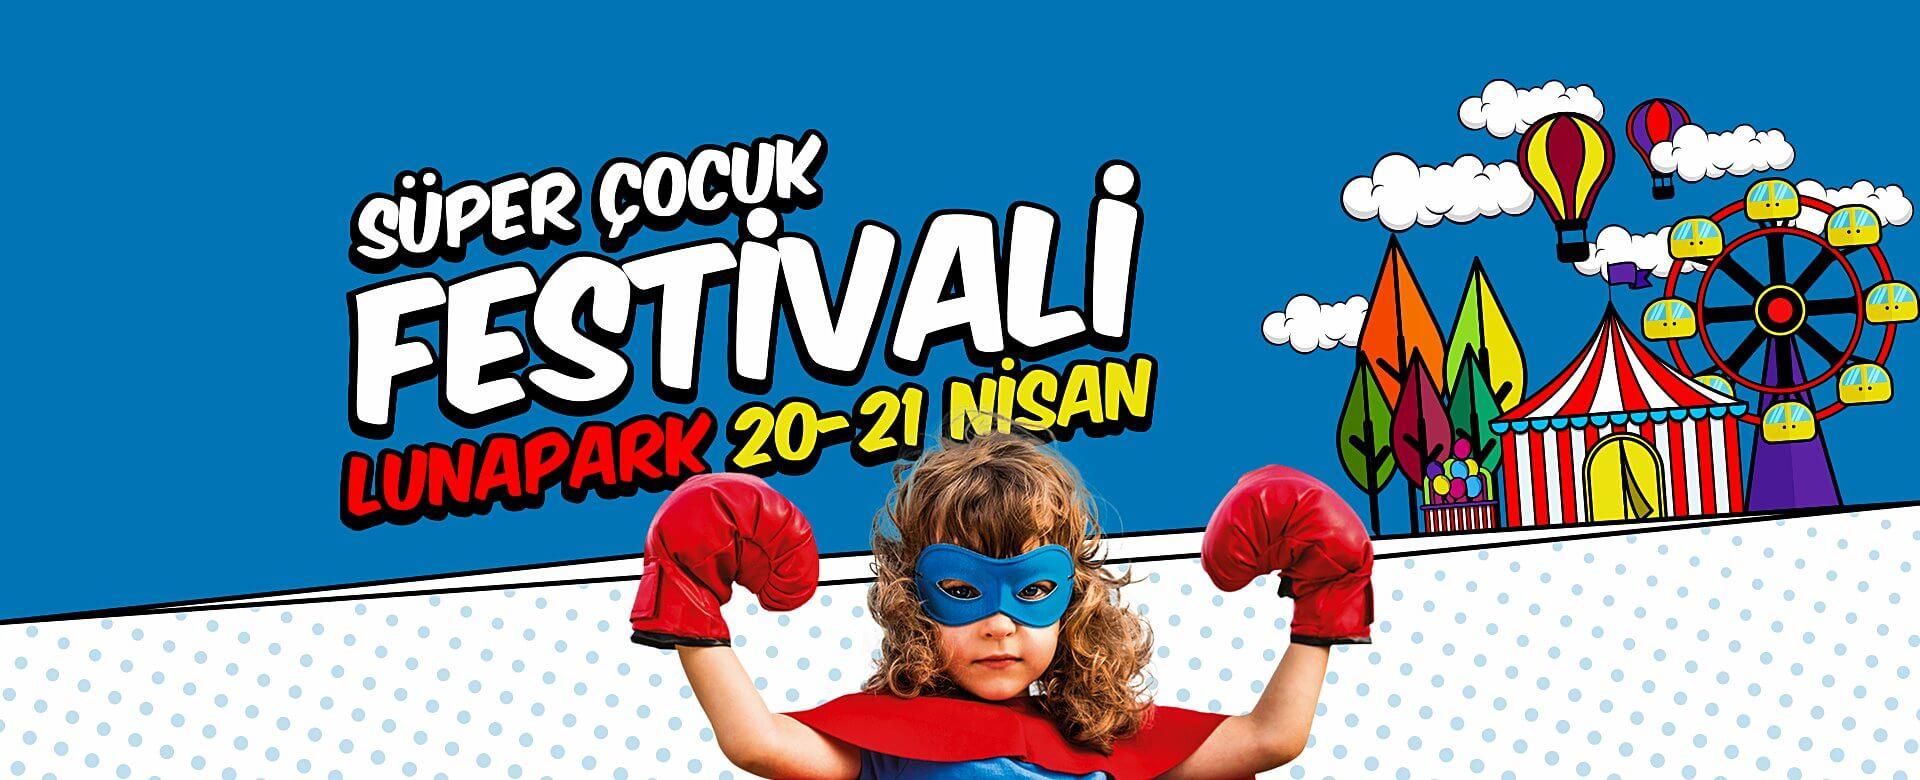 izmir-super-cocuk-festivali